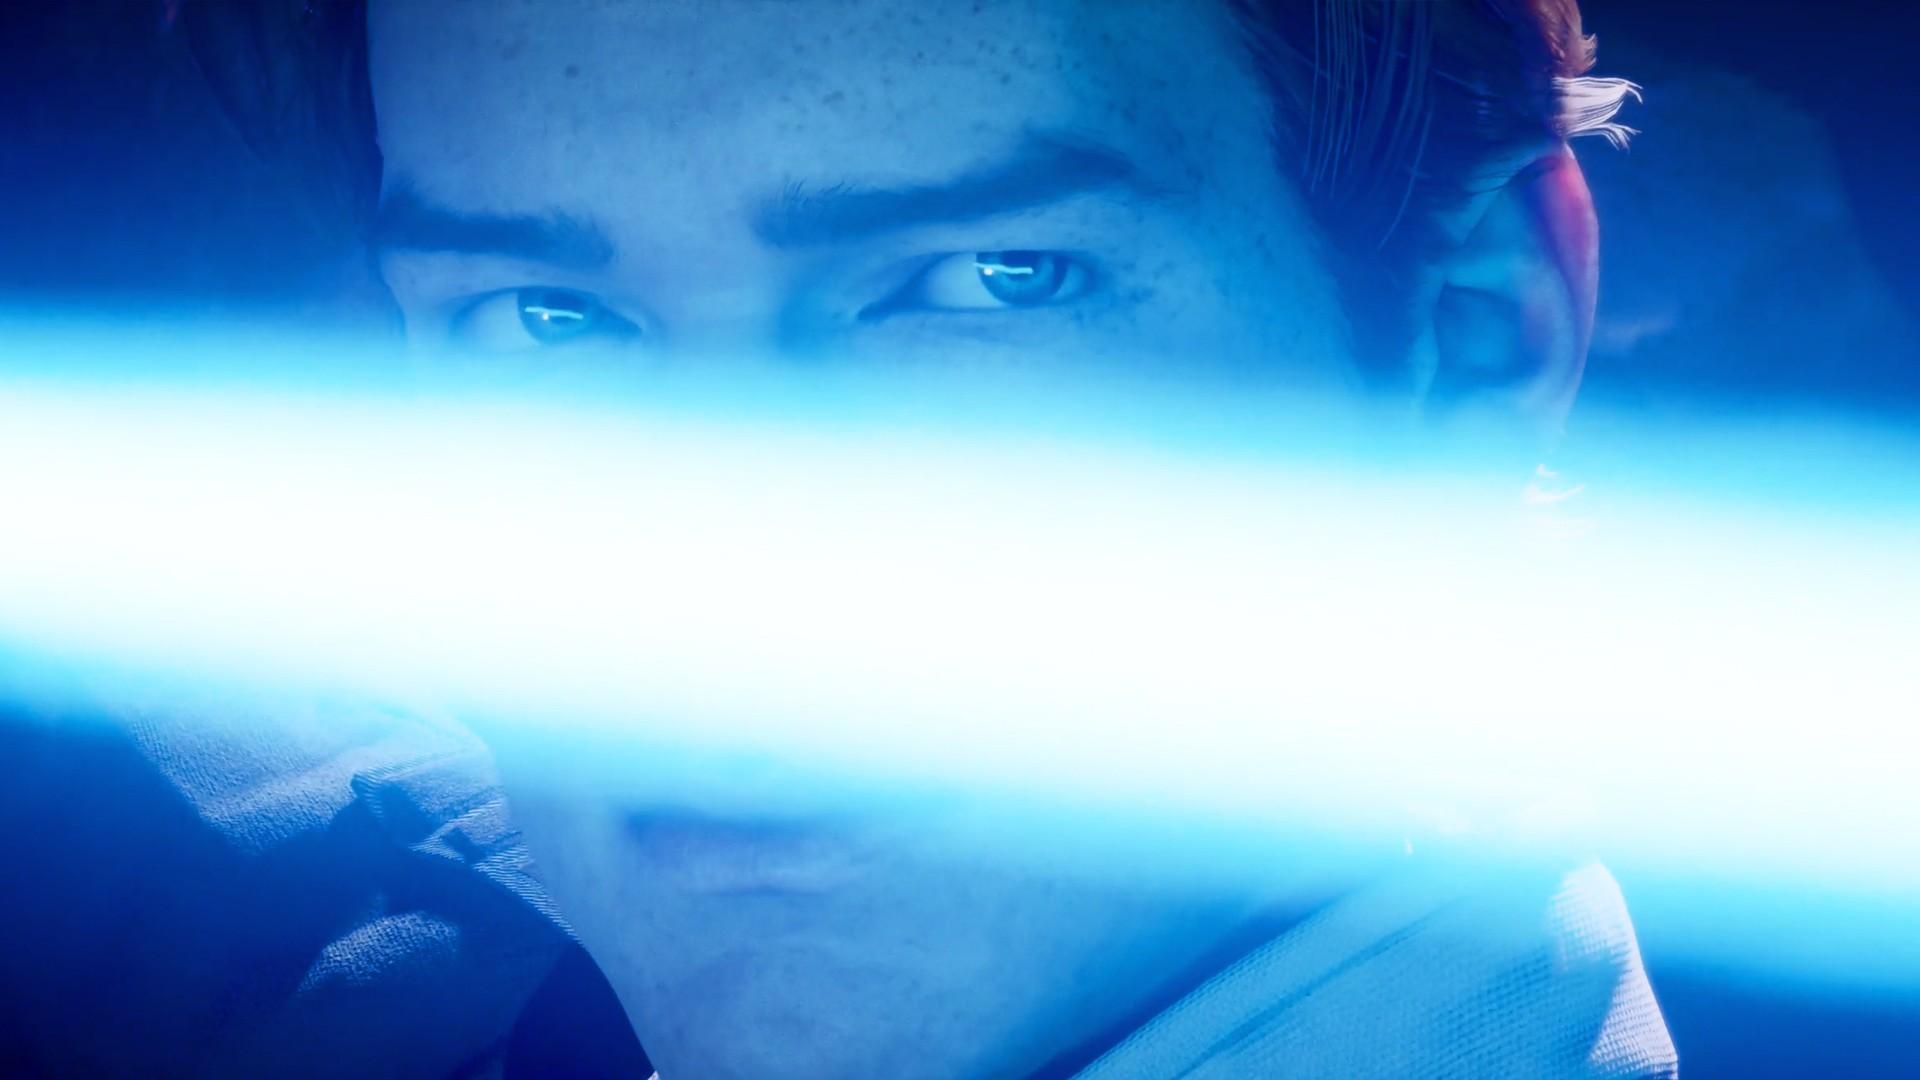 Star Wars Jedi: Fallen Order's gameplay reveal will be at E3 screenshot